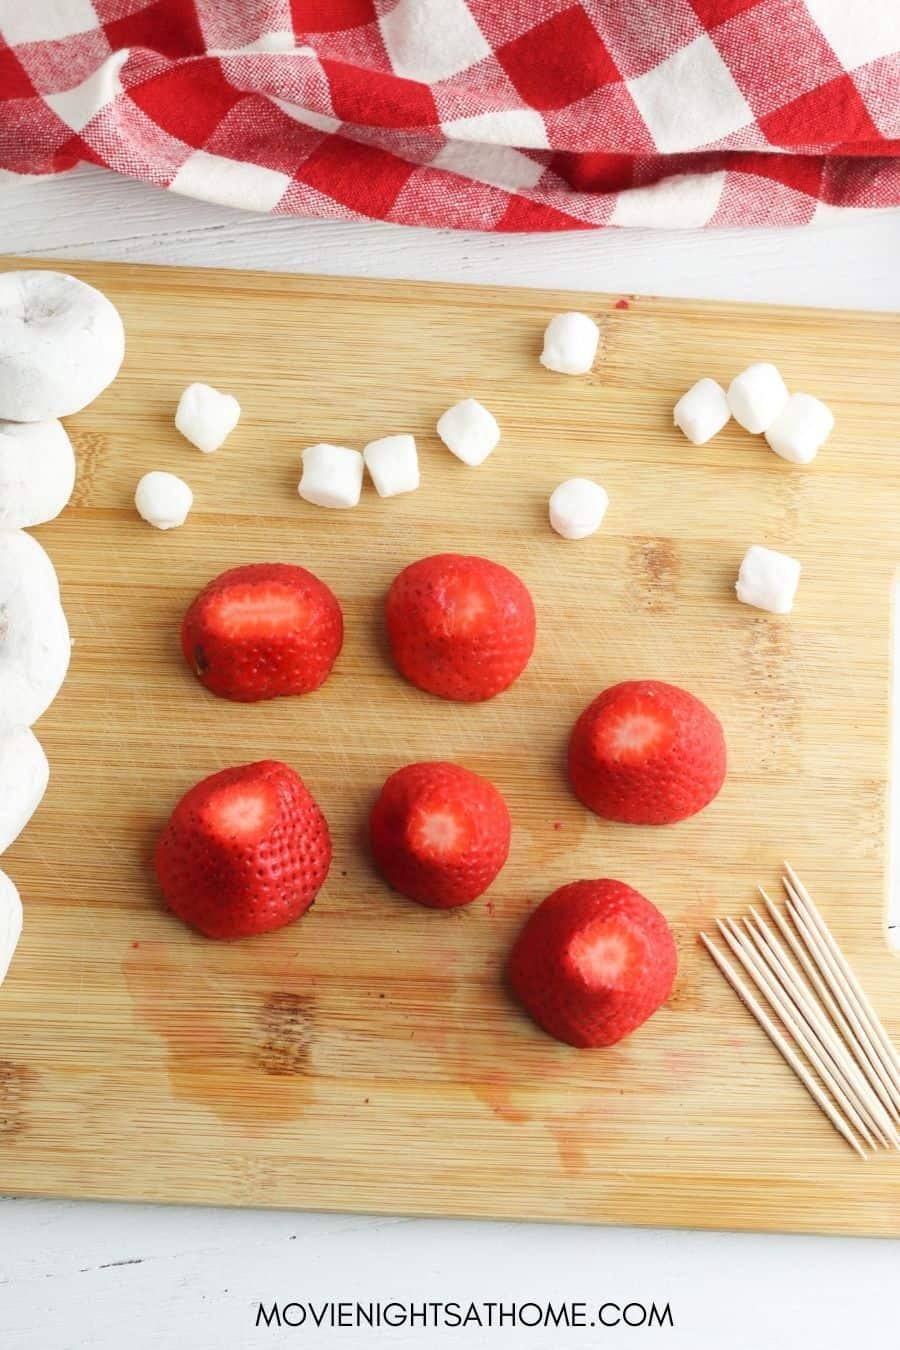 You'll need strawberries, mini marshmallows and mini powdered donuts